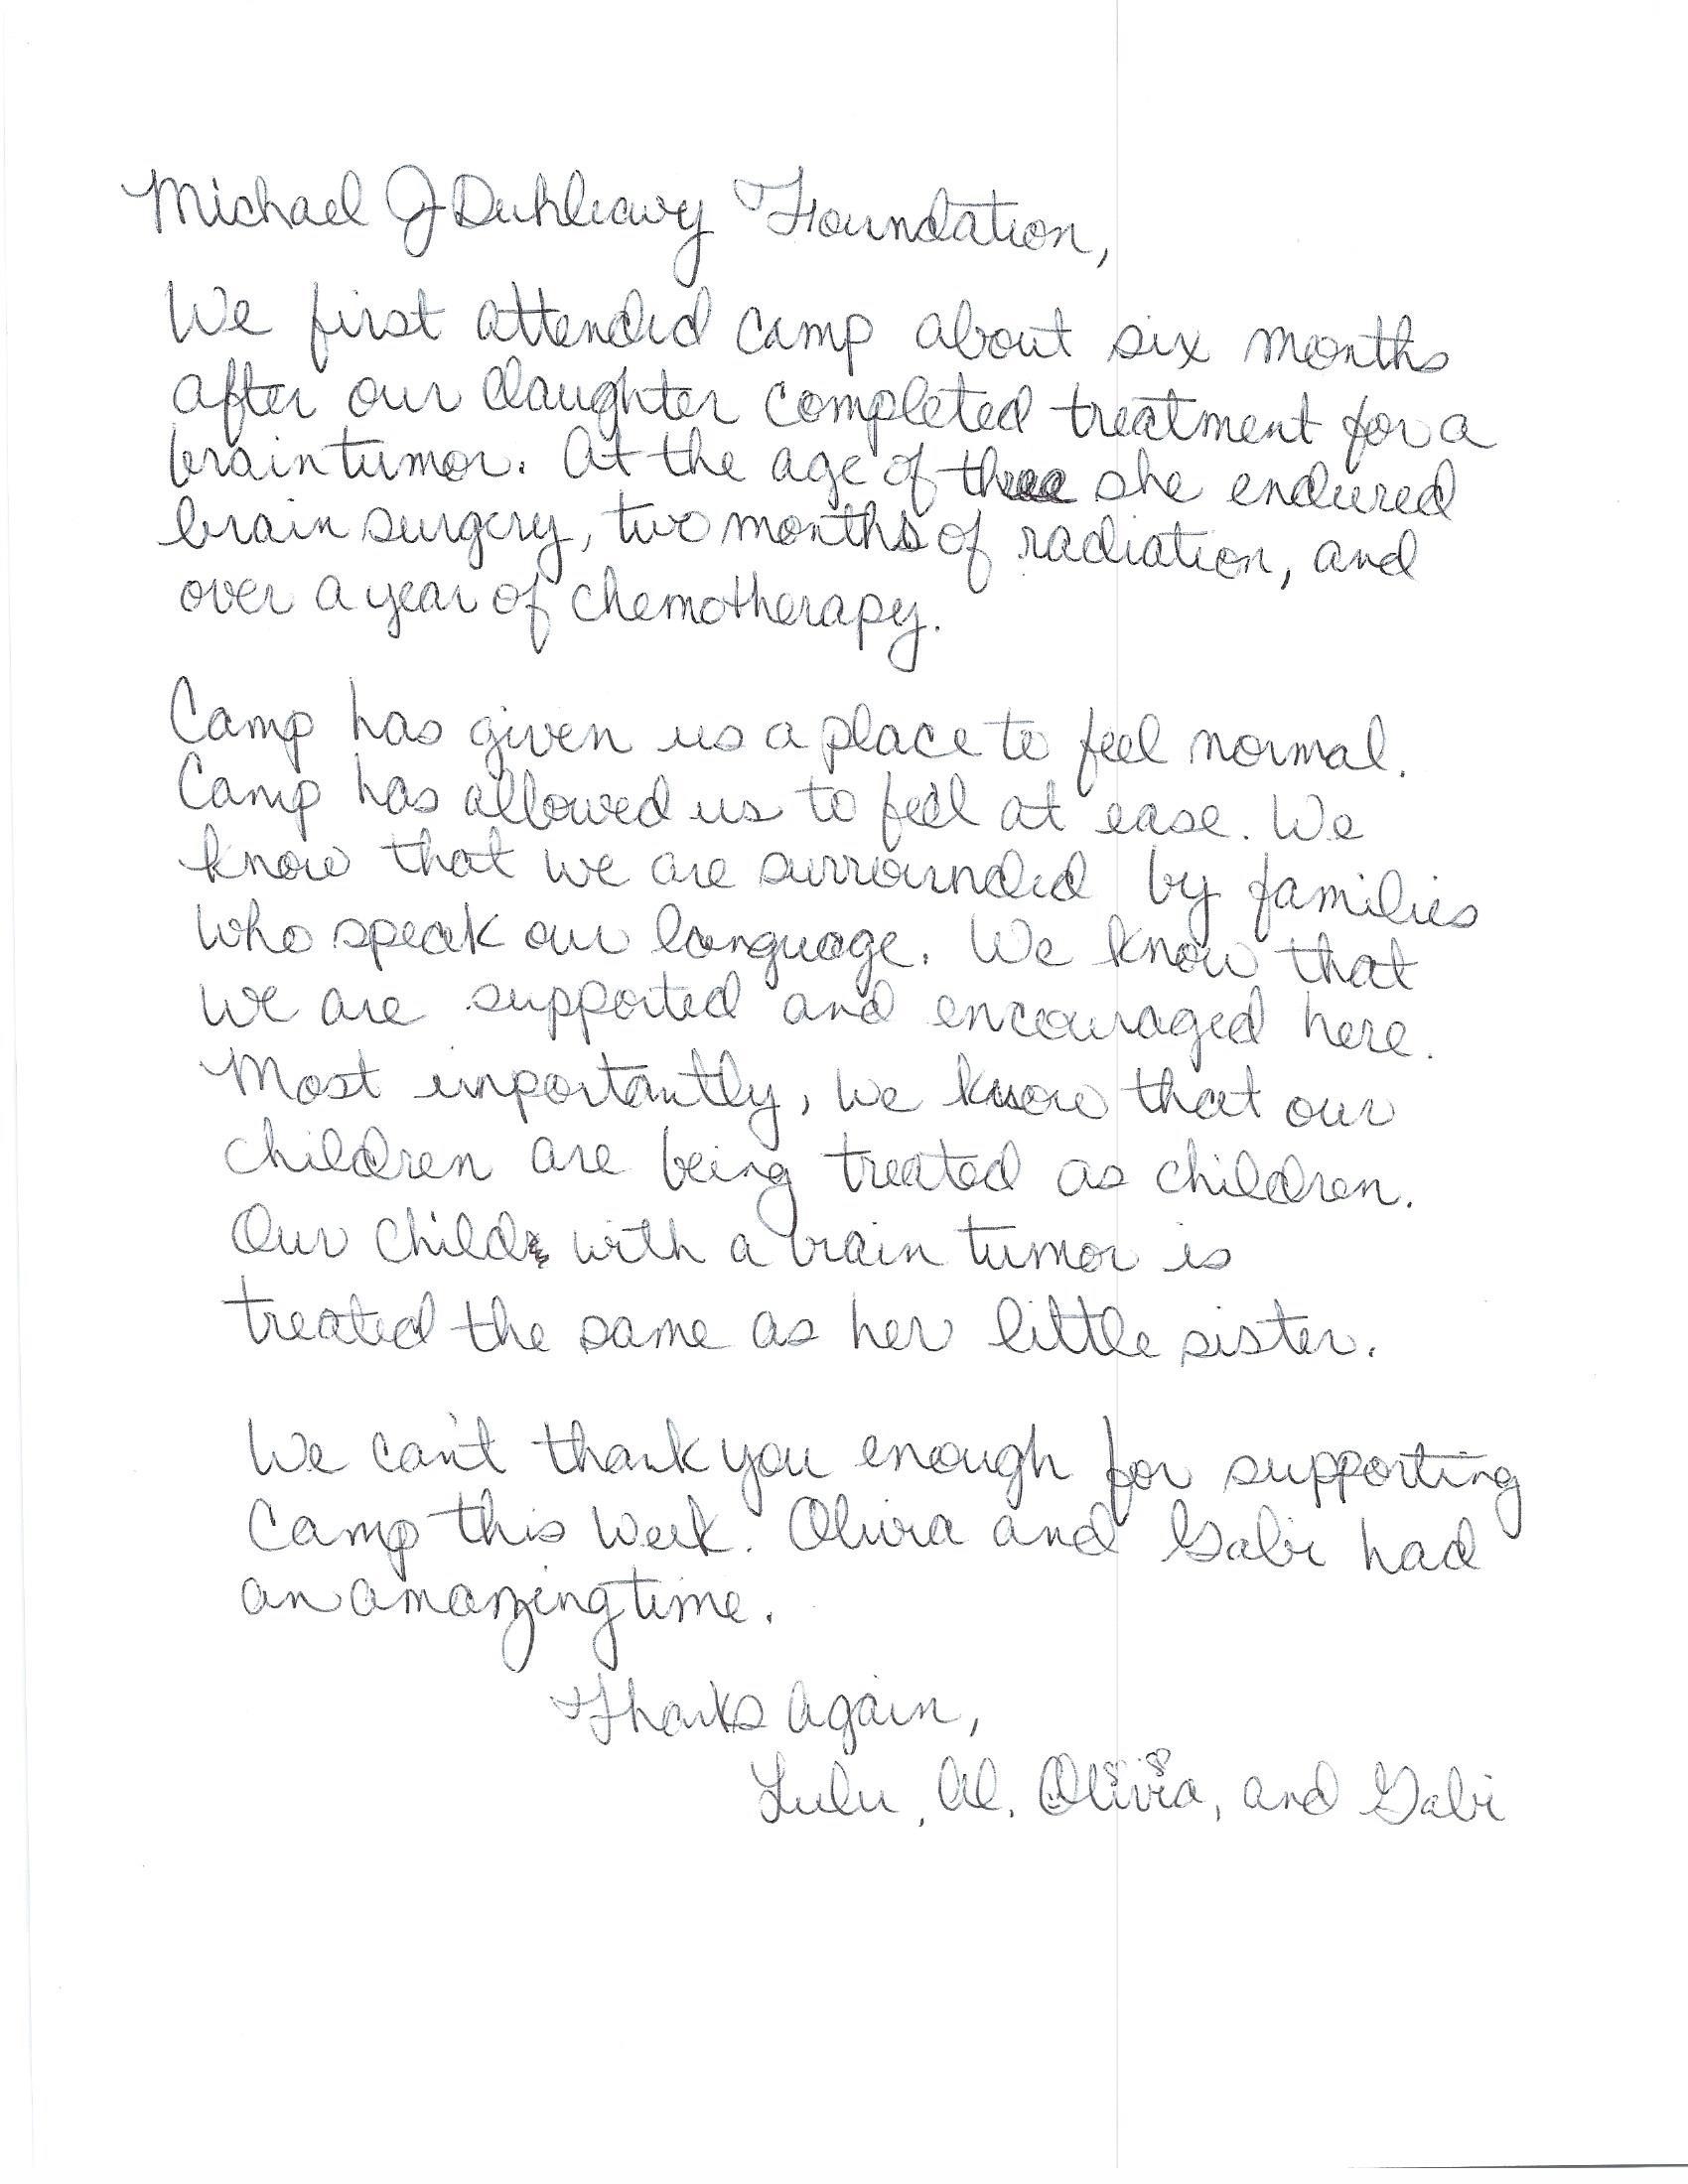 MJD Camp Sunshine client TY letter_Page_2.jpg